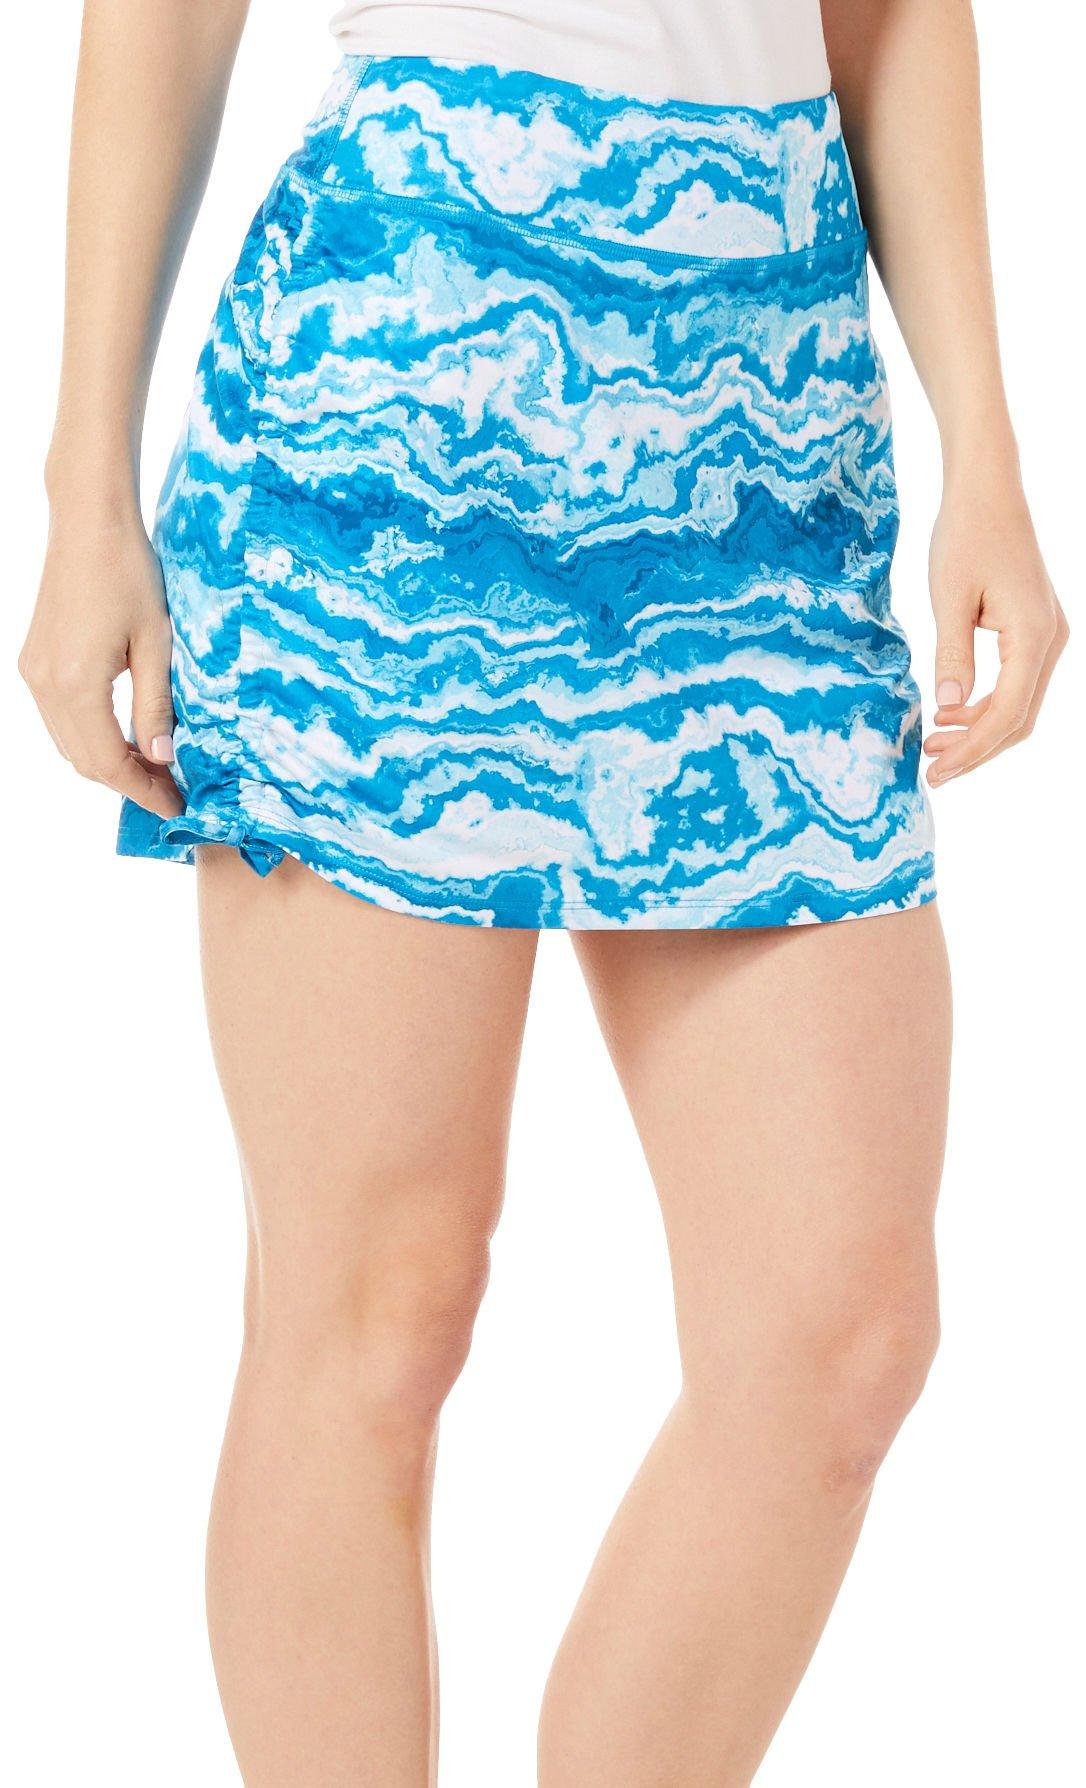 Reel Legends Petite Keep It Cool Agate Print Ruched Skort Medium Petite Blue/White